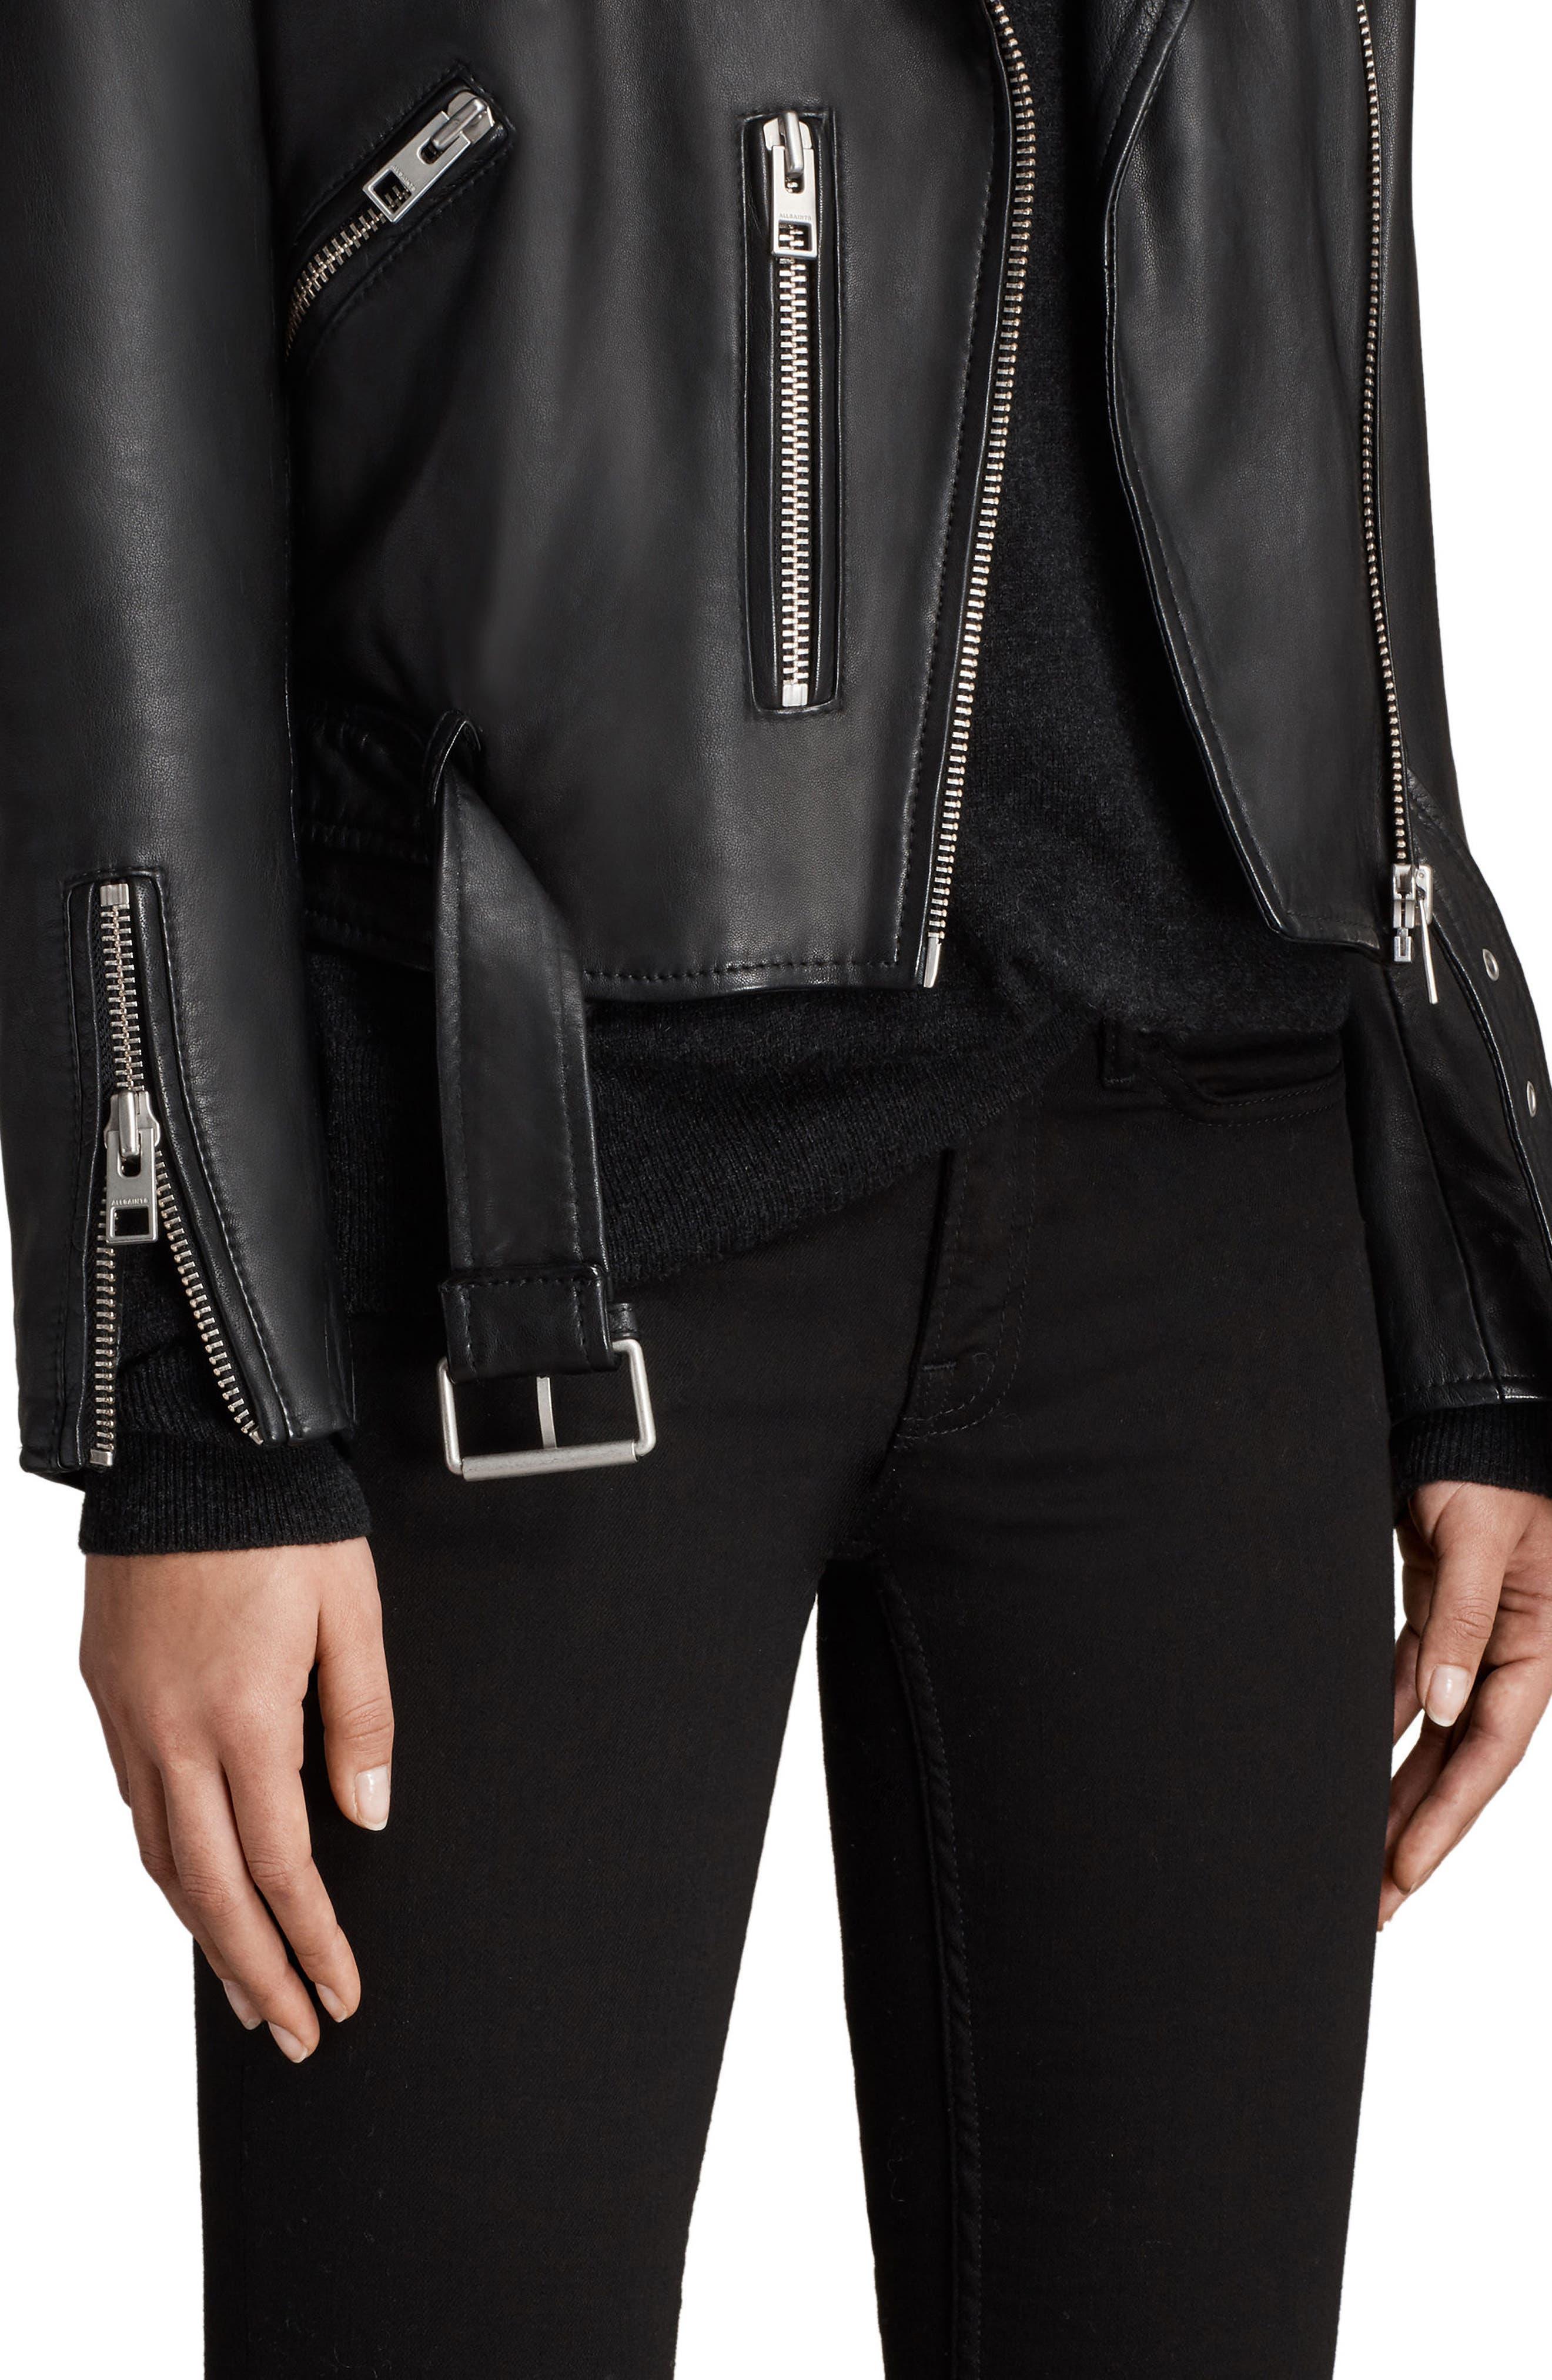 ALLSAINTS, Balfern Leather Biker Jacket, Alternate thumbnail 5, color, BLACK